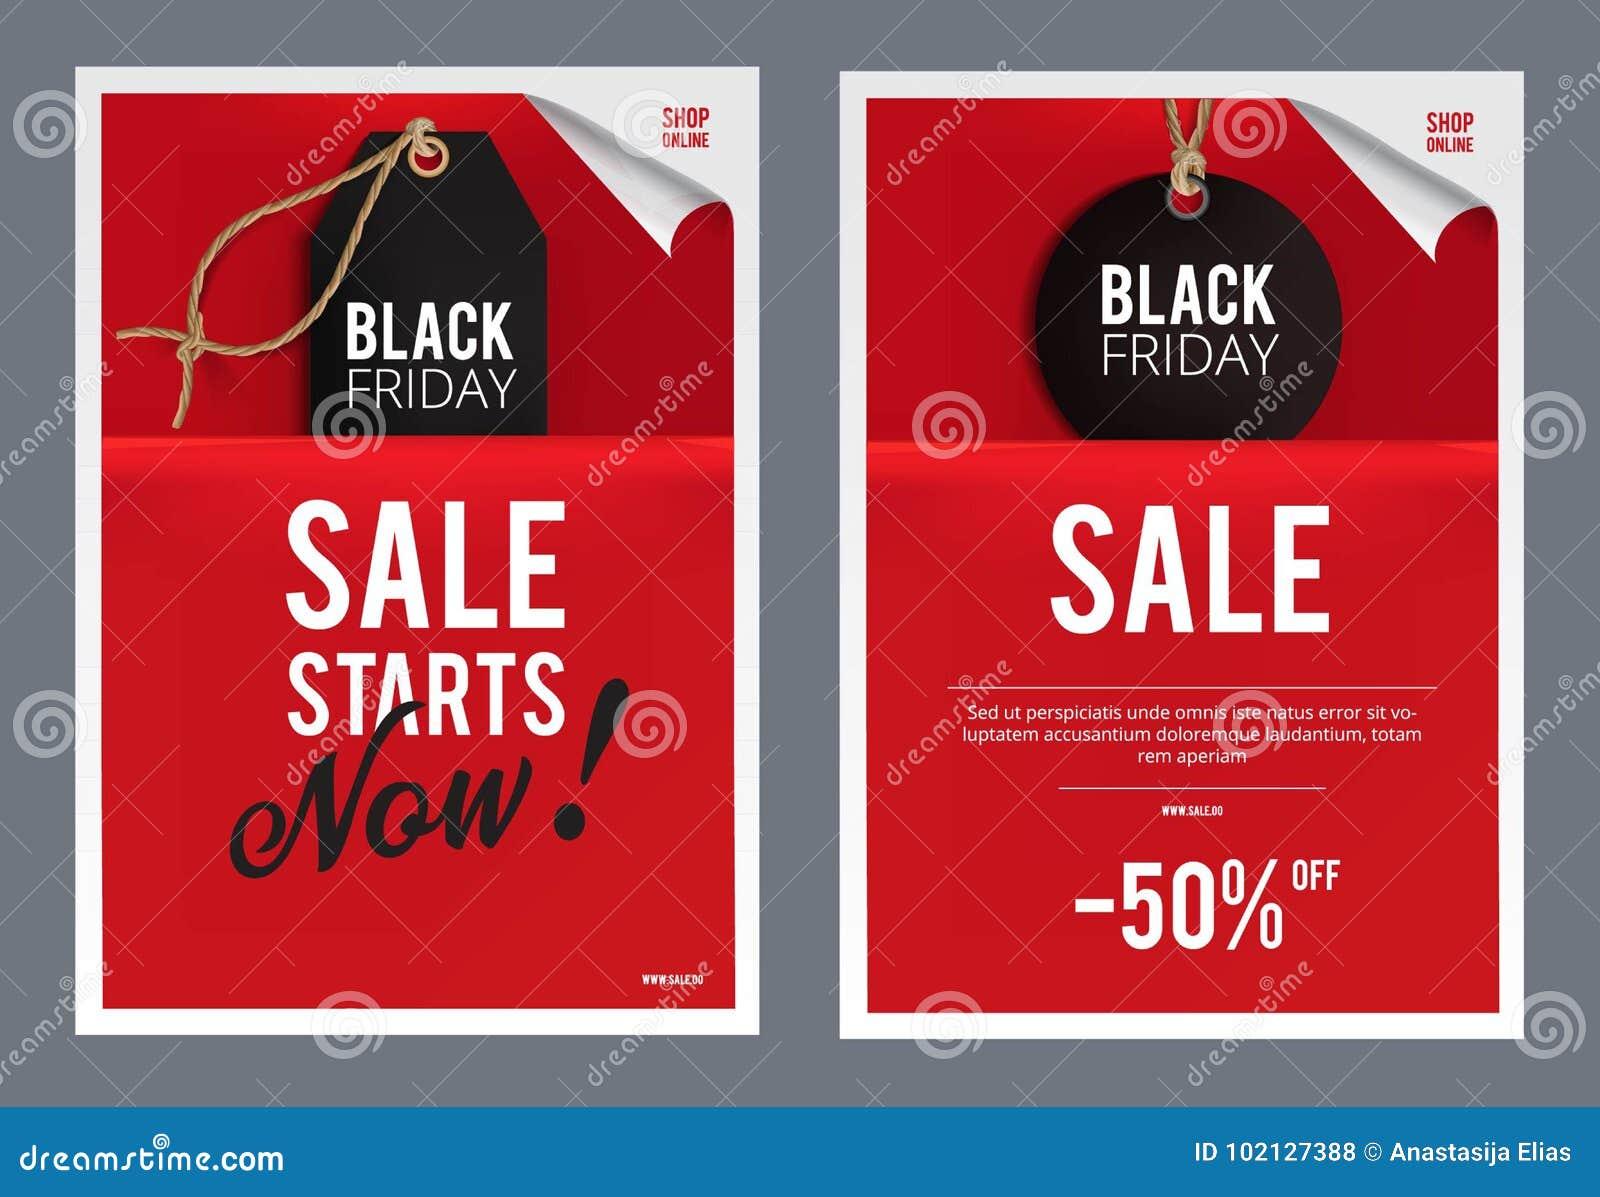 black friday sales template stock illustration illustration of